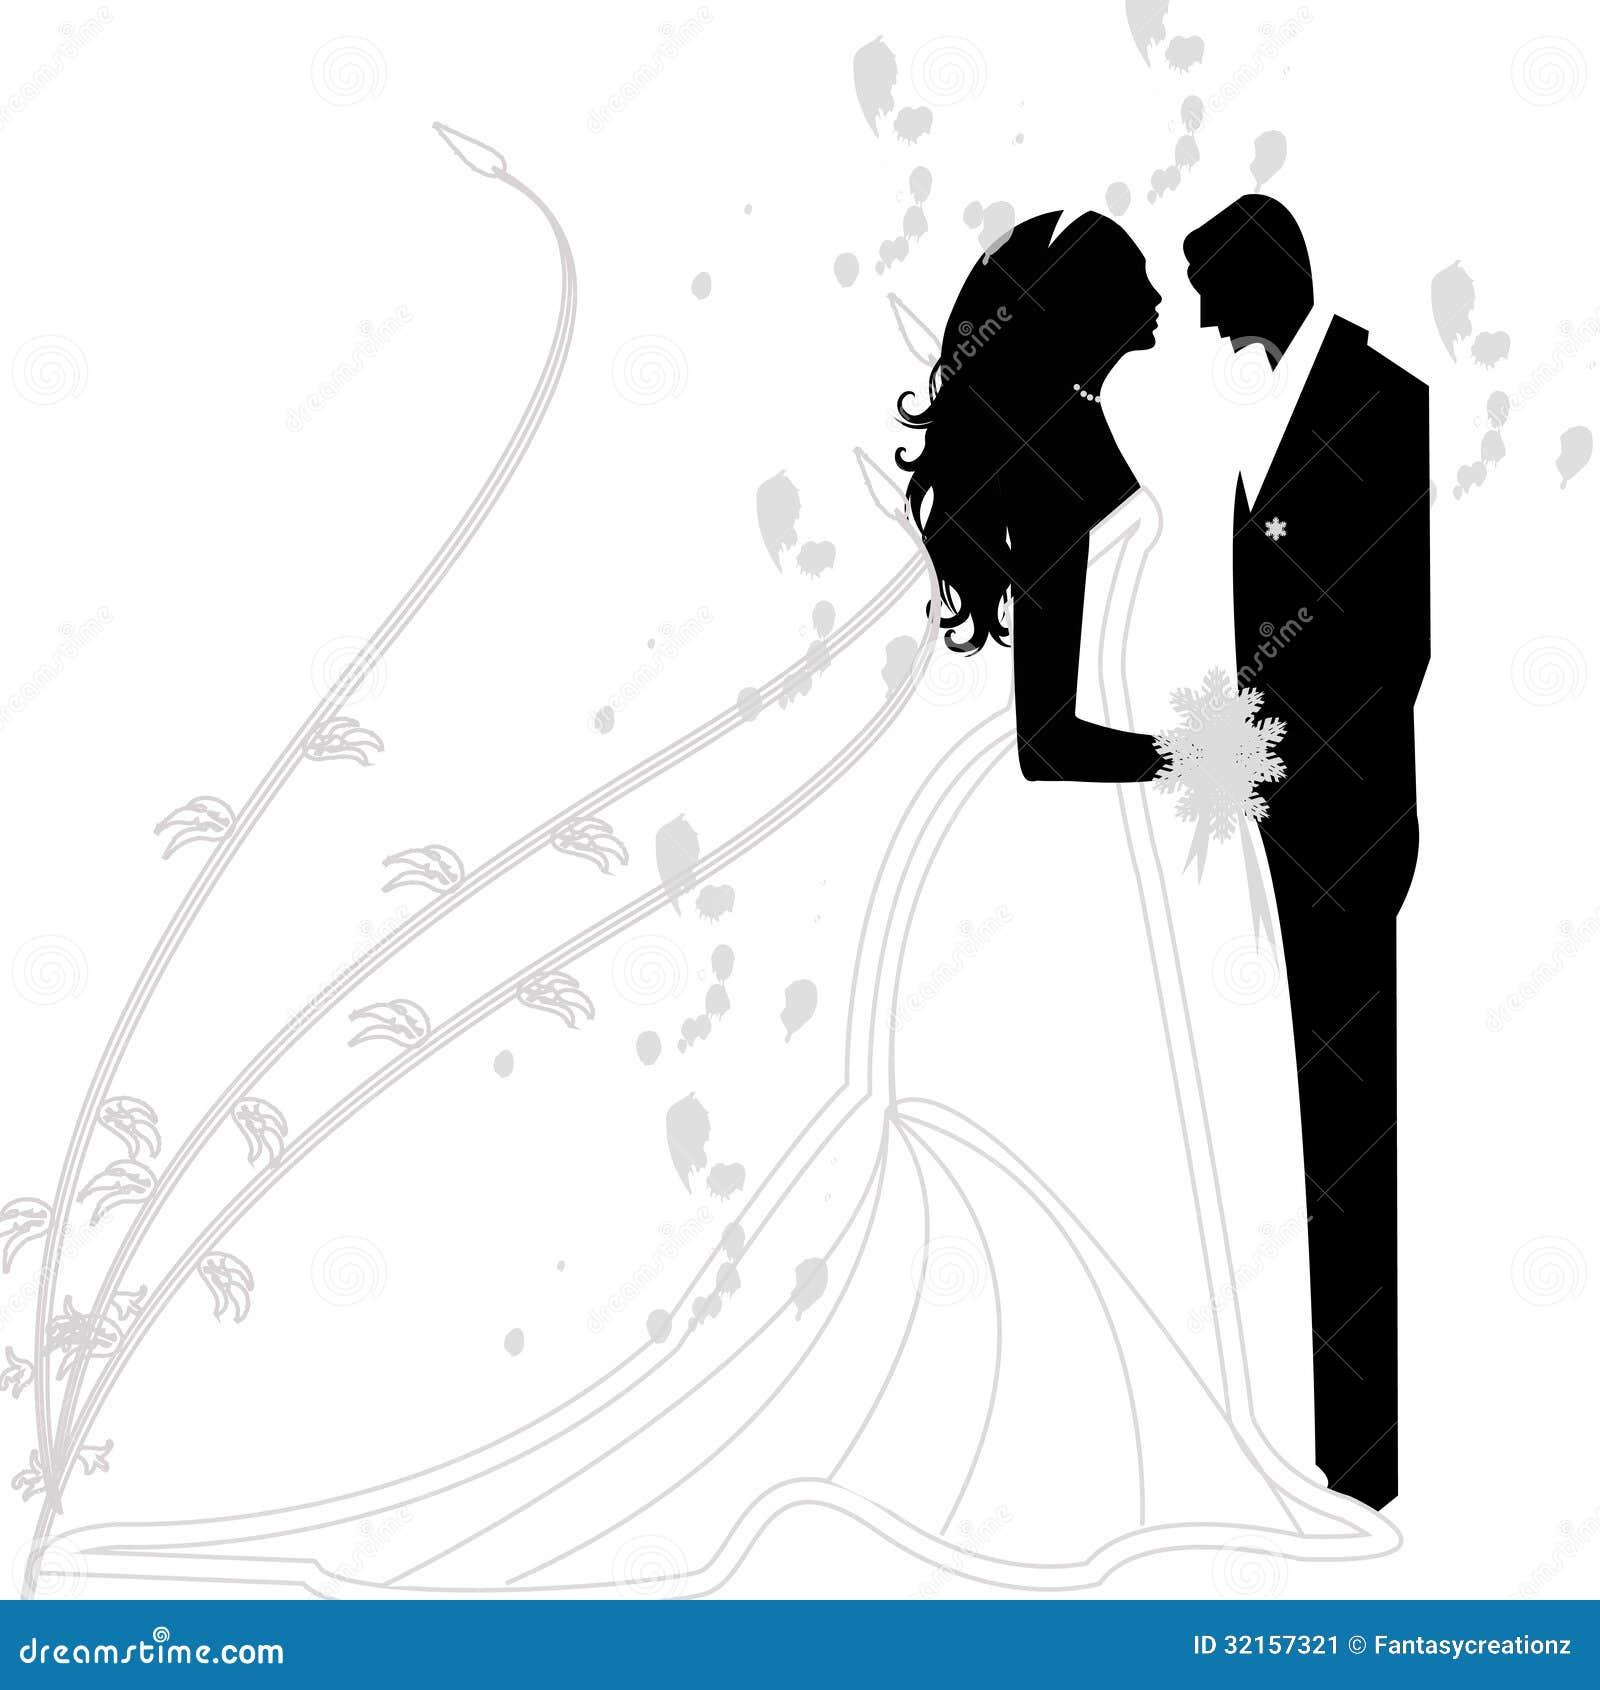 free clipart of wedding couple - photo #11